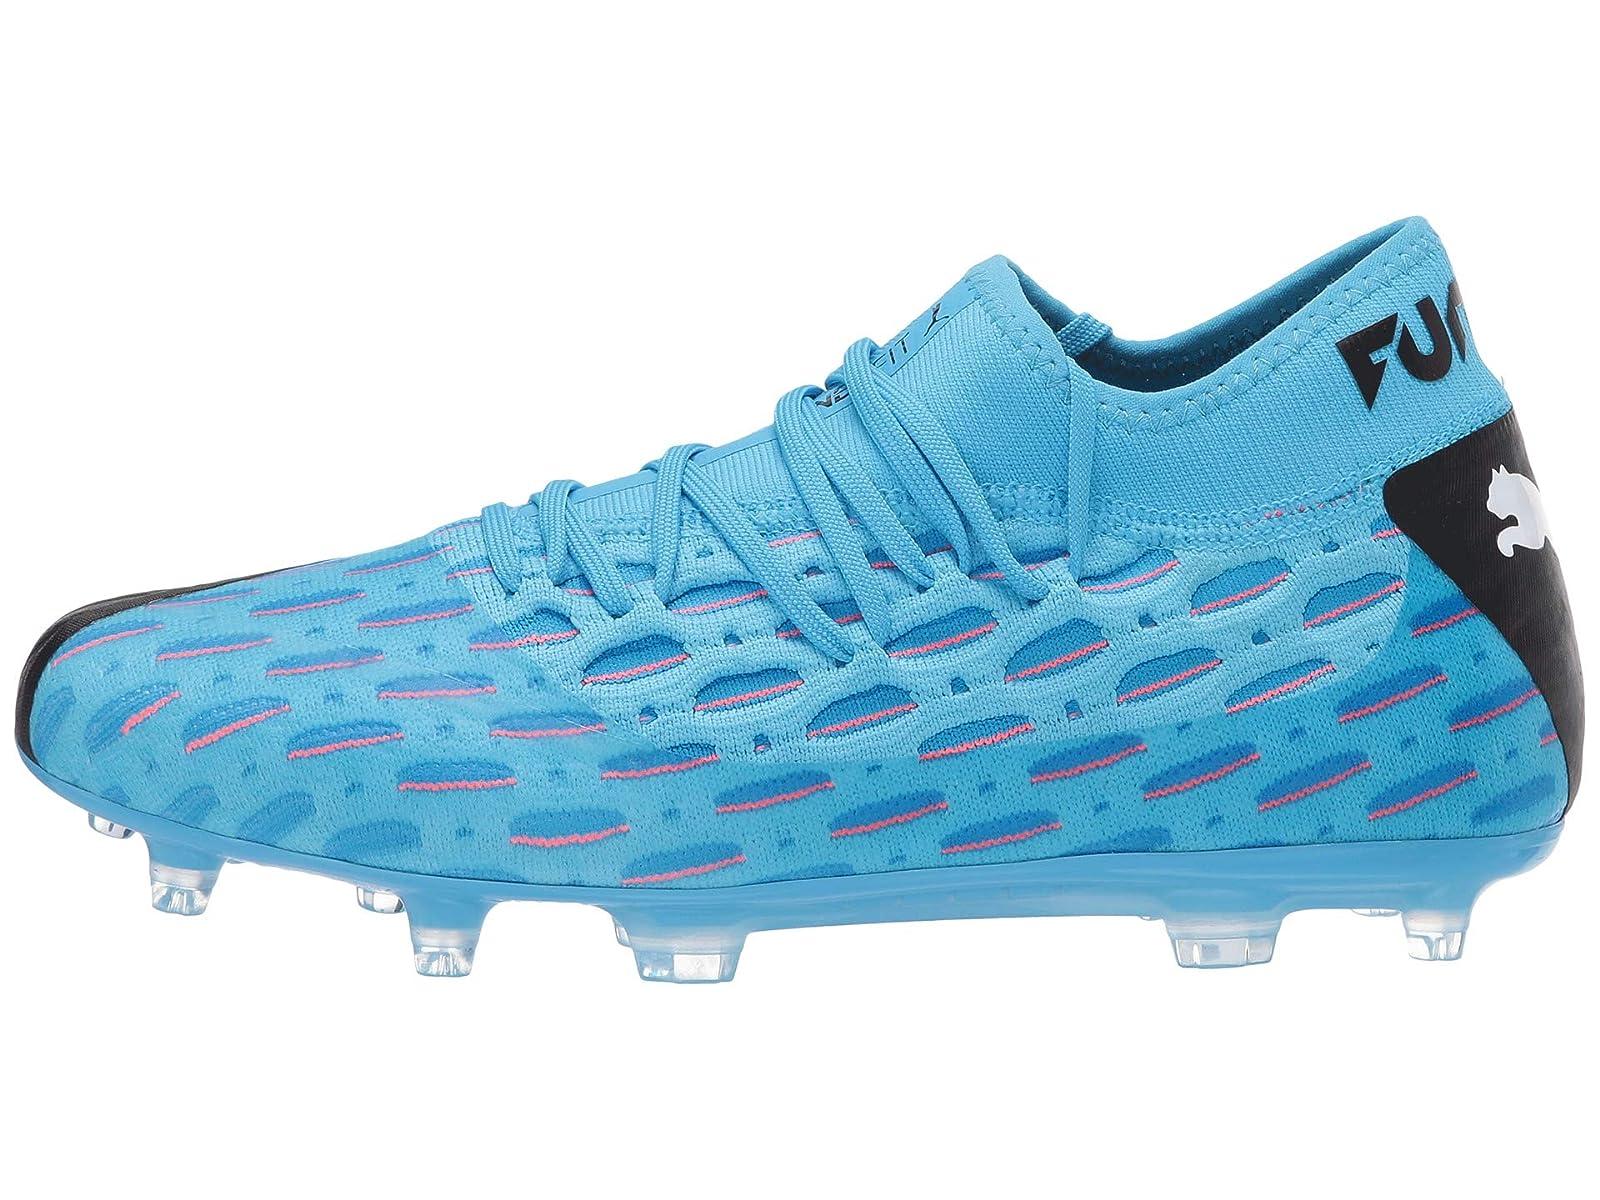 Man-039-s-Sneakers-amp-Athletic-Shoes-PUMA-Future-5-2-Netfit-FG-AG thumbnail 5